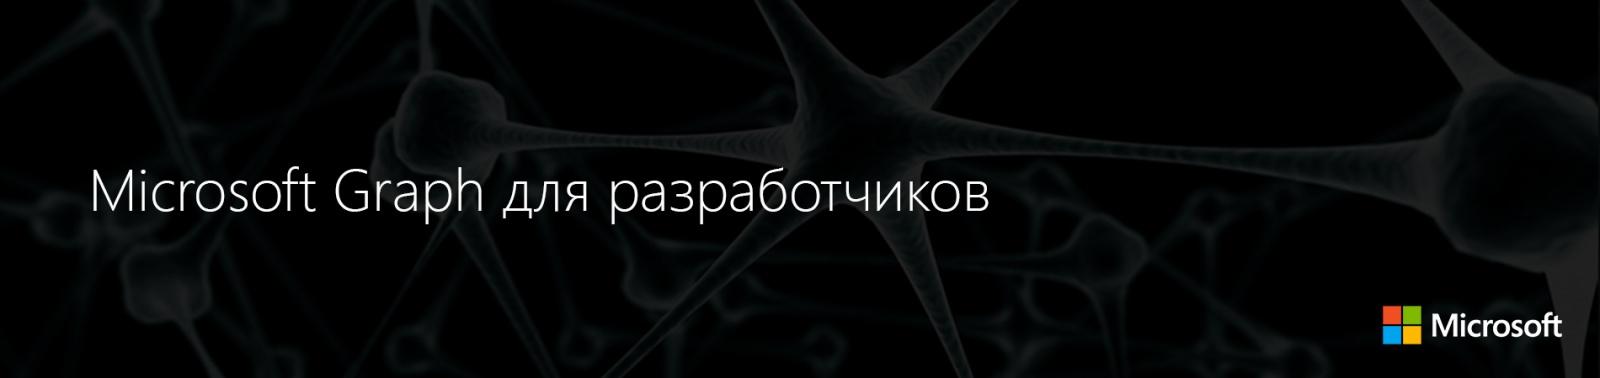 Microsoft Graph для разработчиков - 1